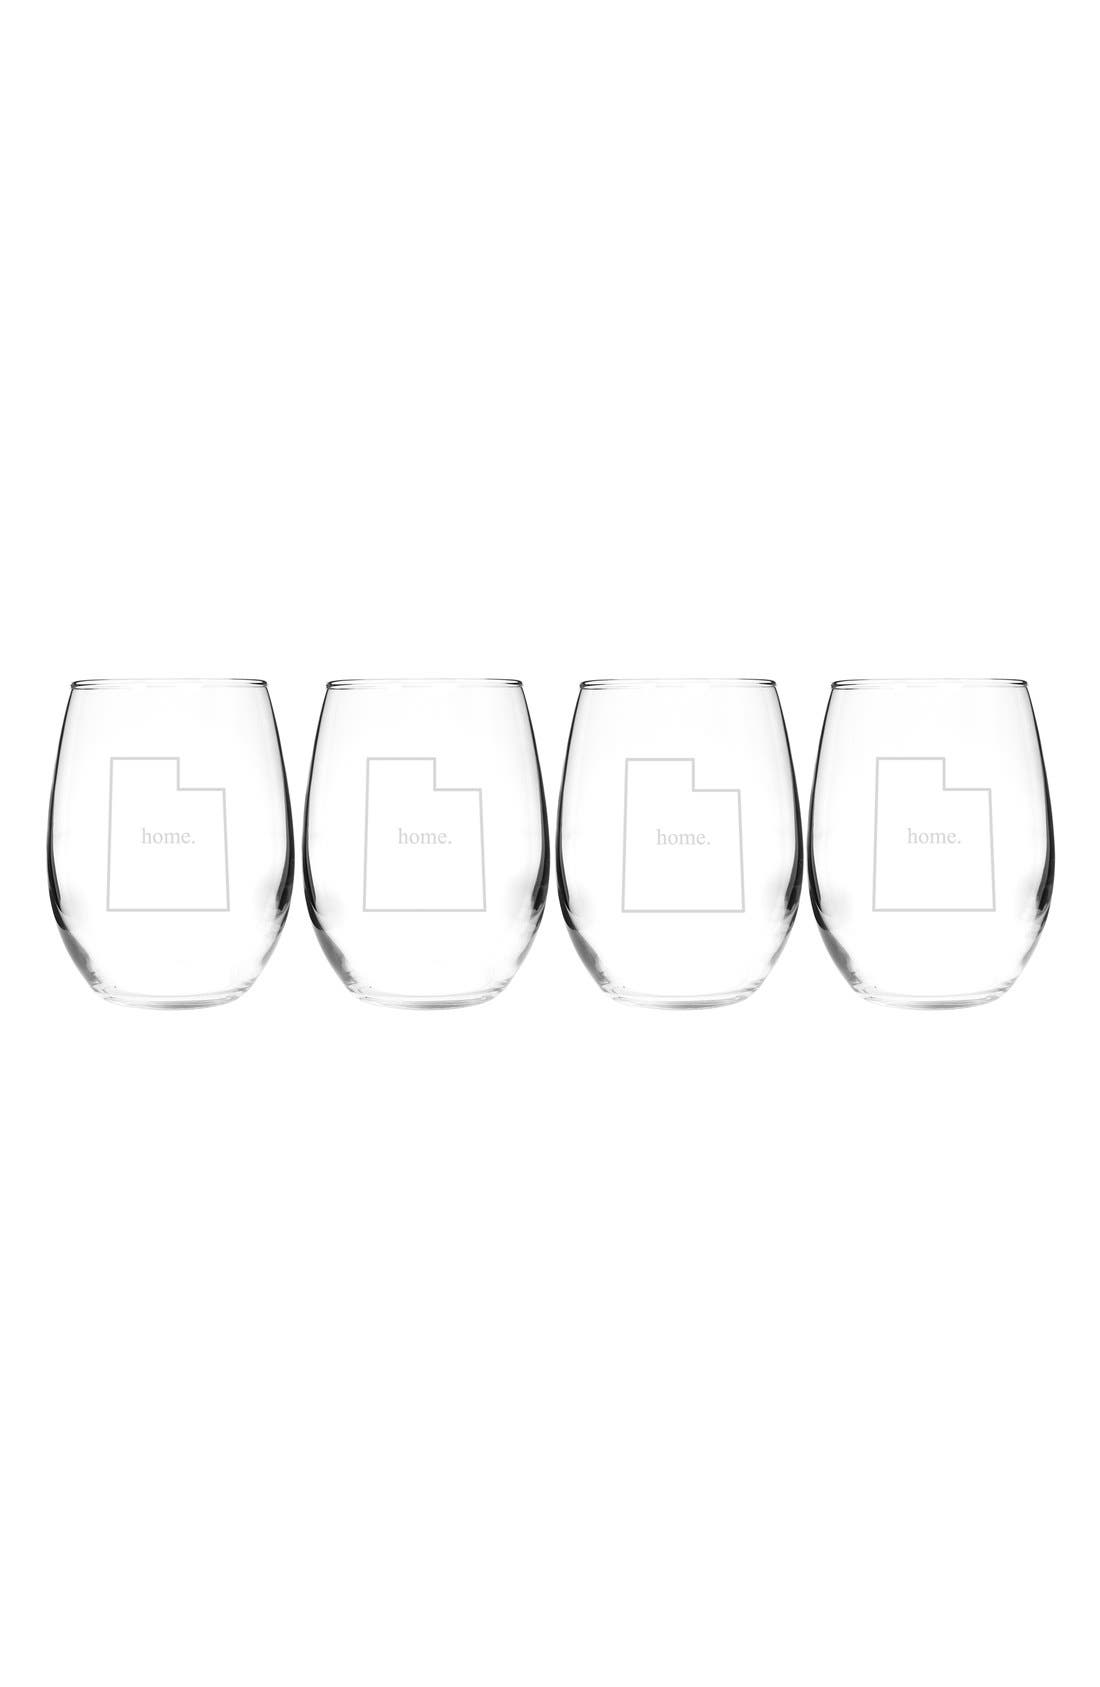 Home State Set of 4 Stemless Wine Glasses,                         Main,                         color, Ut - Utah